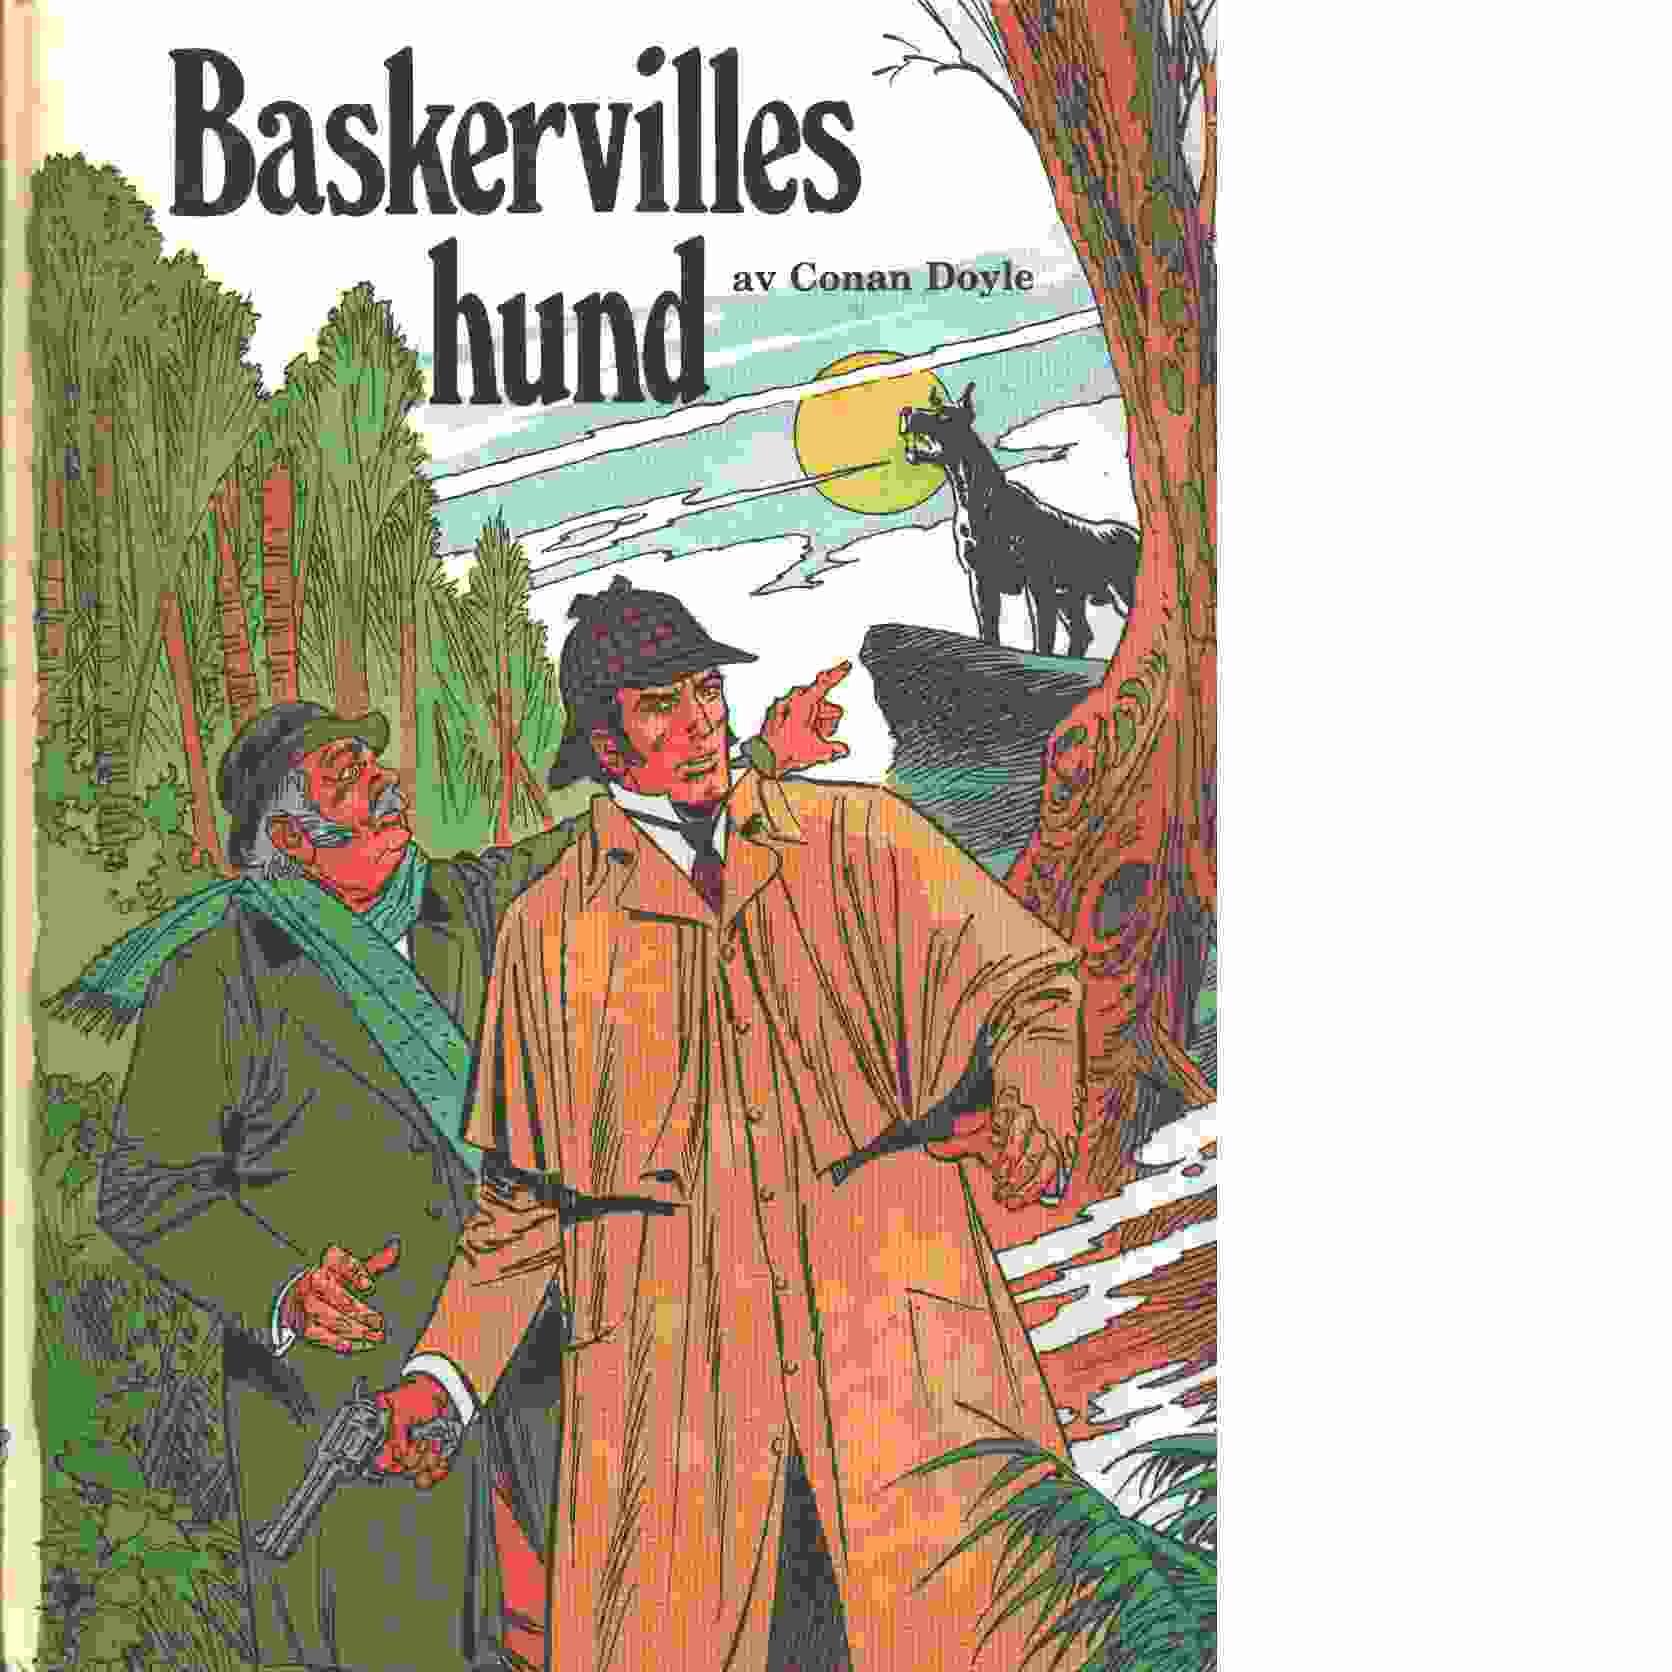 Baskervilles hund - Sir Conan Doyle, Arthur